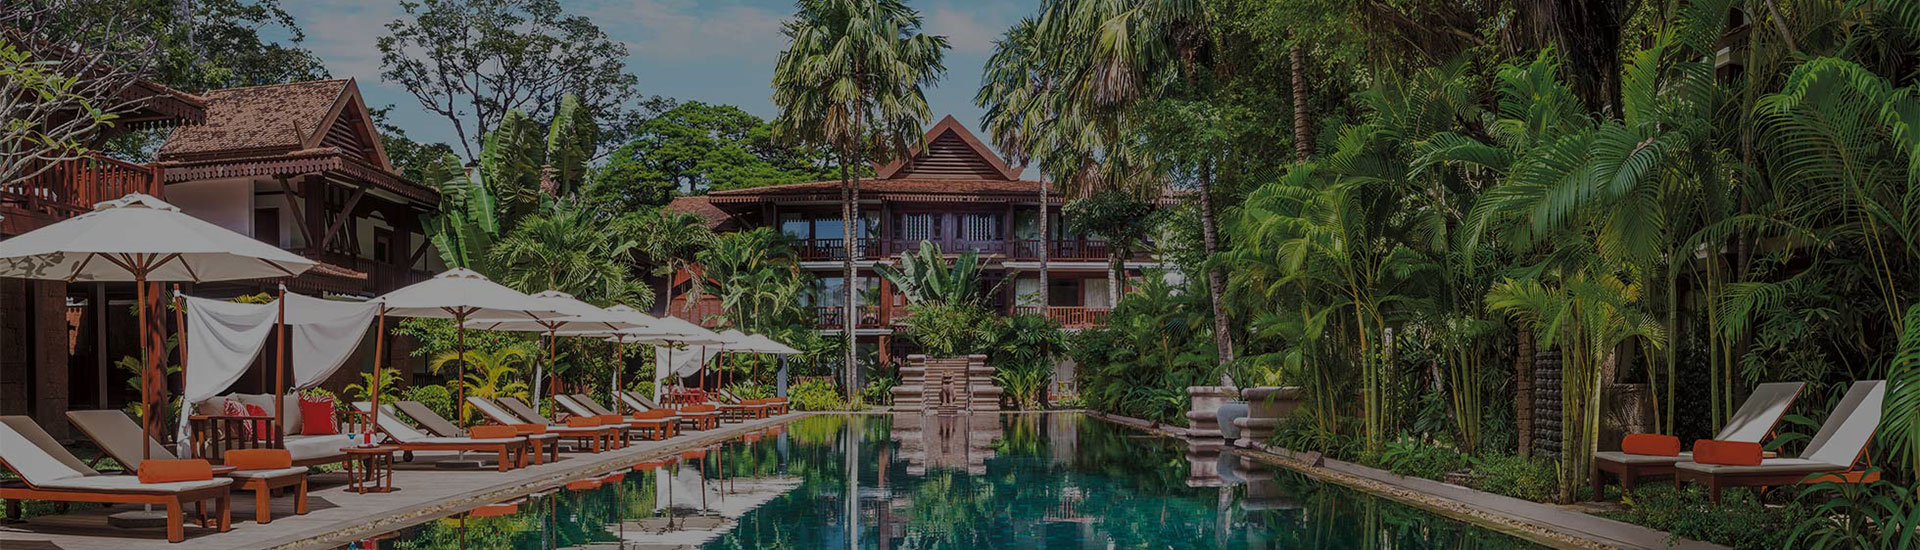 Magie du luxe cambodge